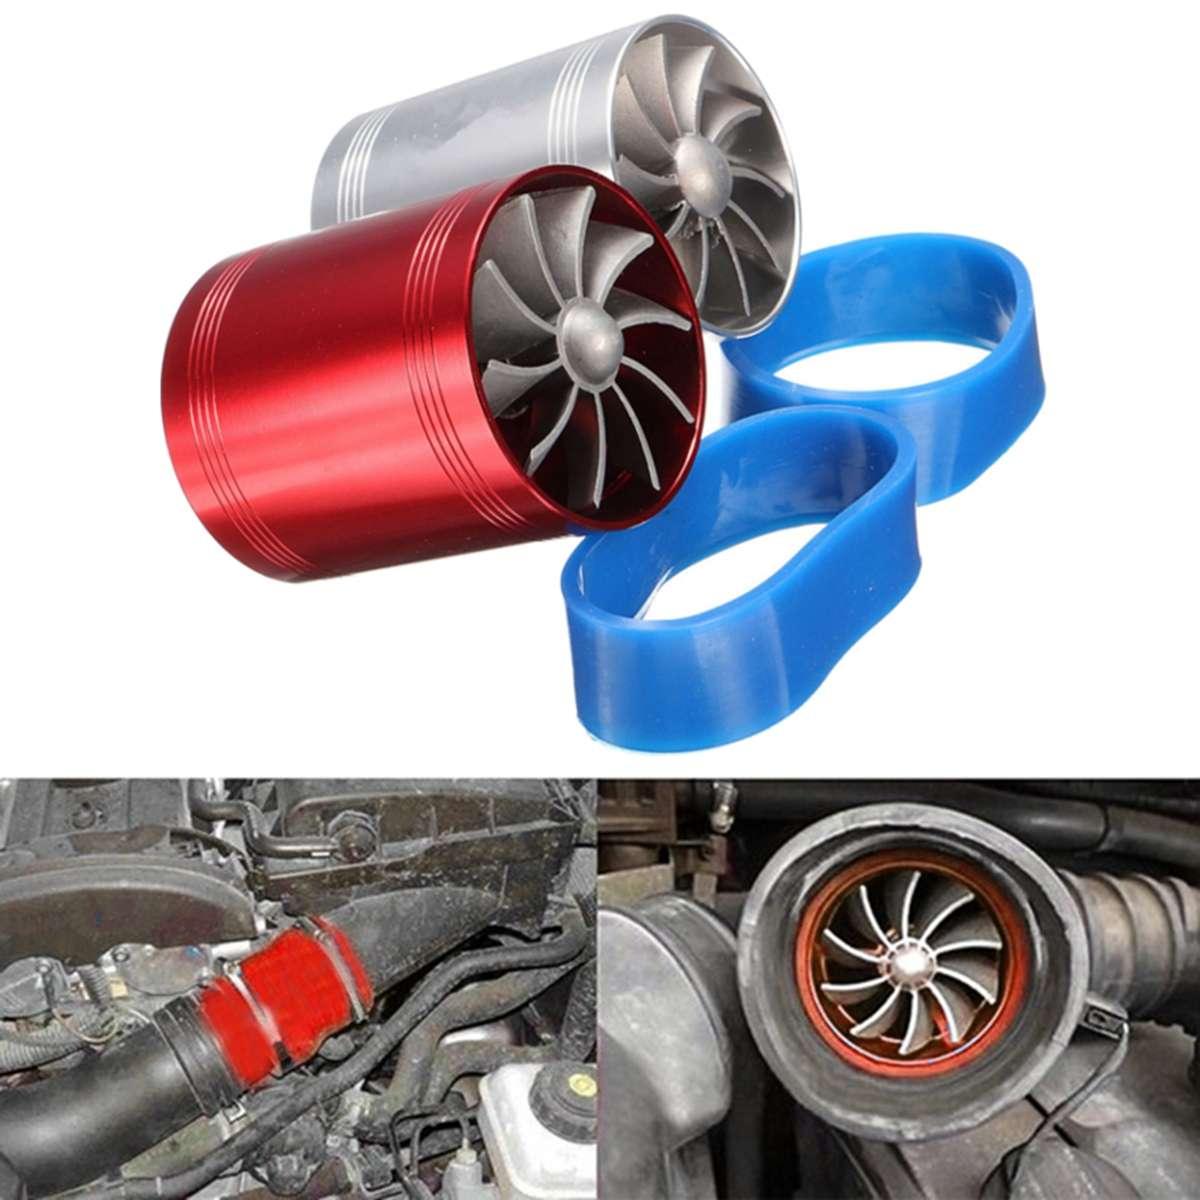 1x Auto Car SuperCharger Air Intake Turbo Engine Turbine Dual-Fan Aluminum Alloy